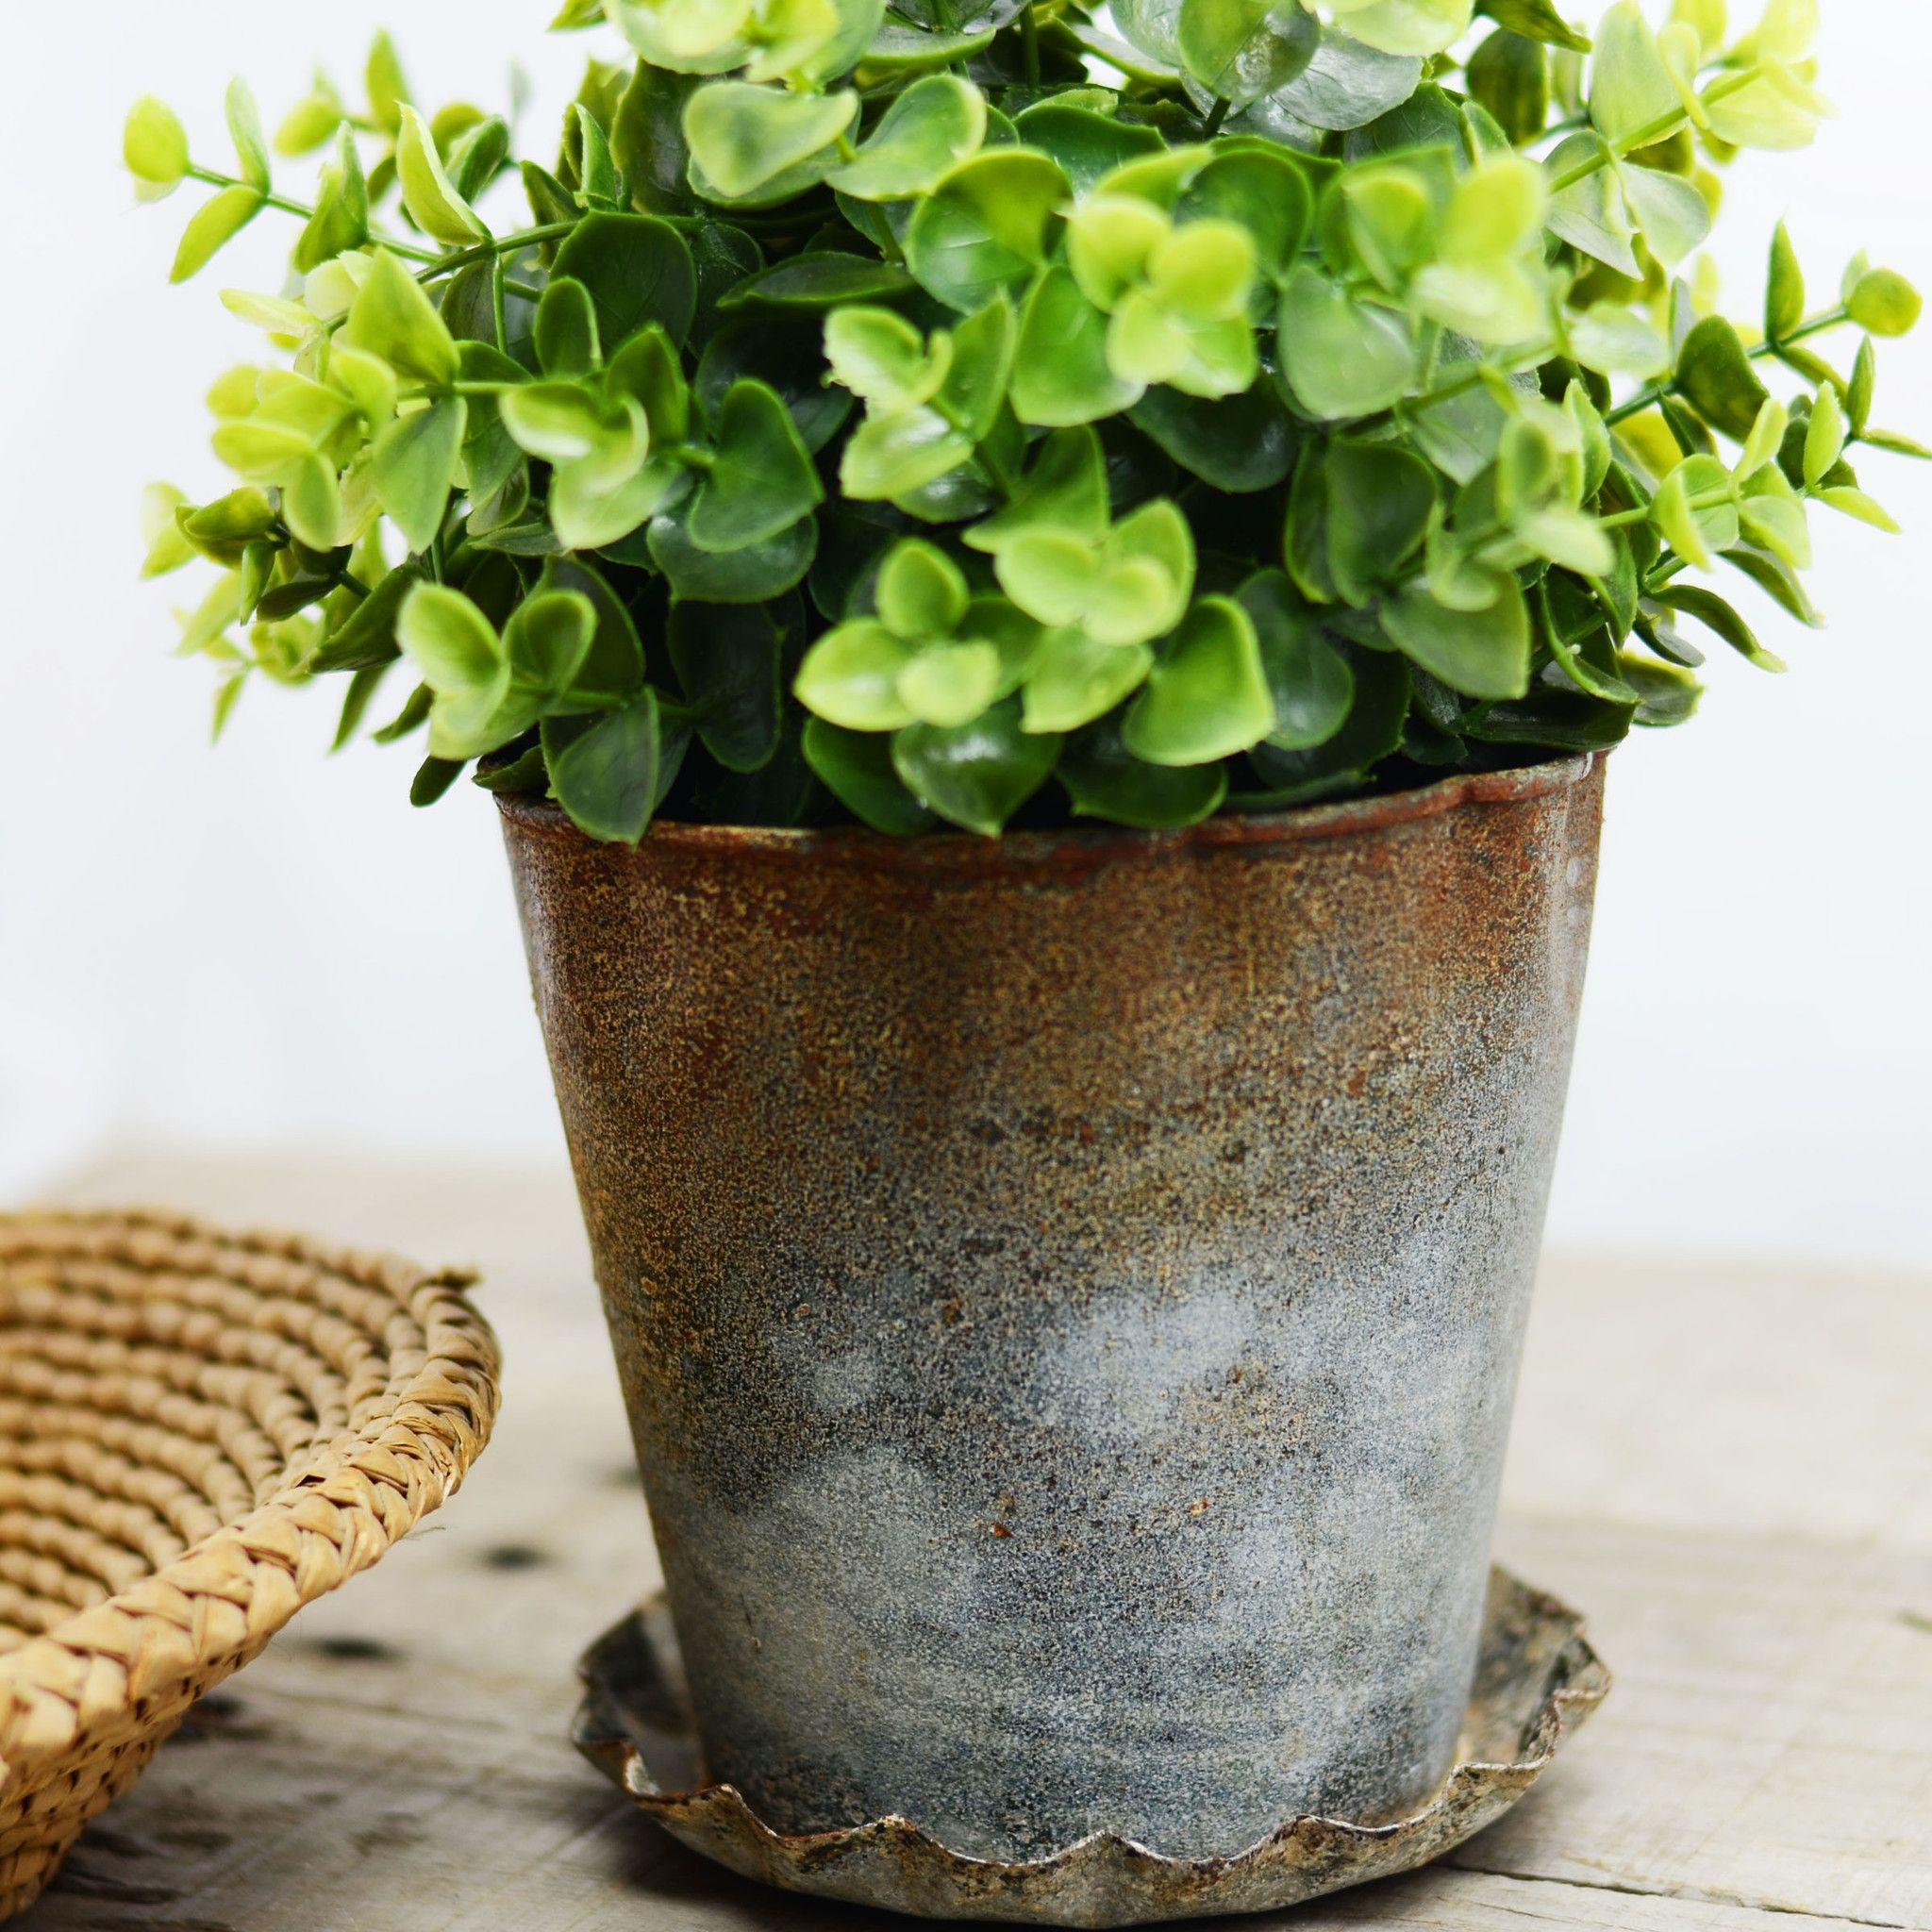 Farmhouse Zinc Flower Pot with Scalloped Dish Flower